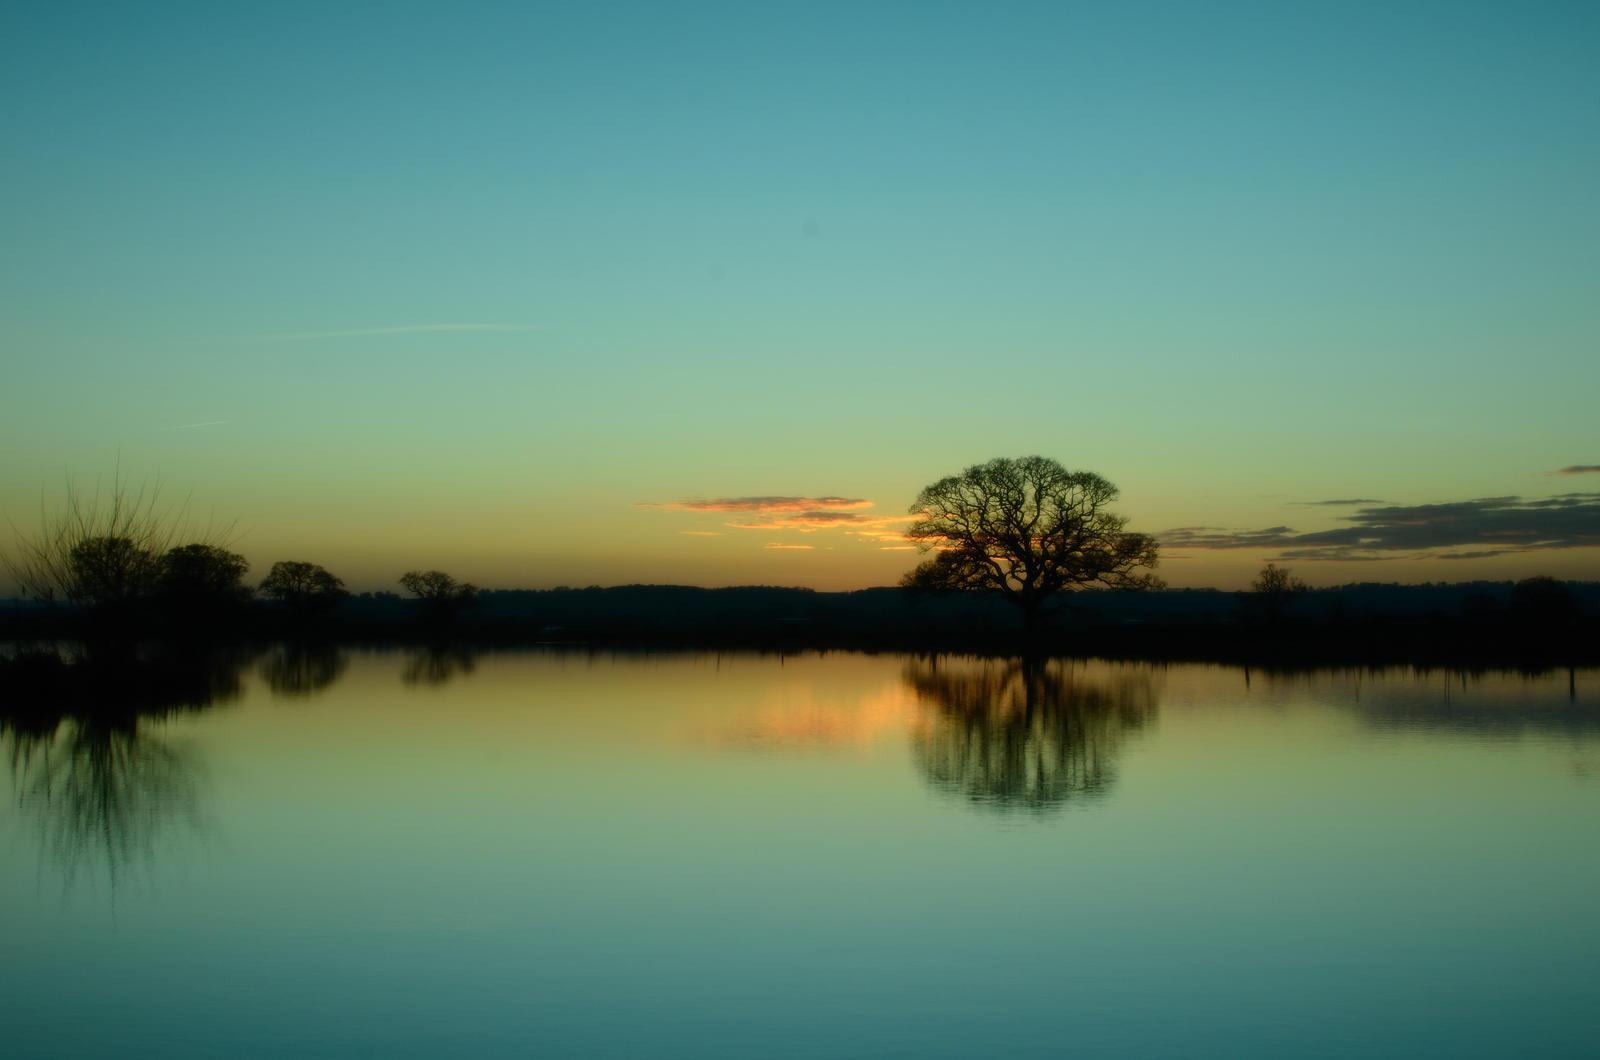 Sunset - Cokin Fishing Lakes 1 by murkin